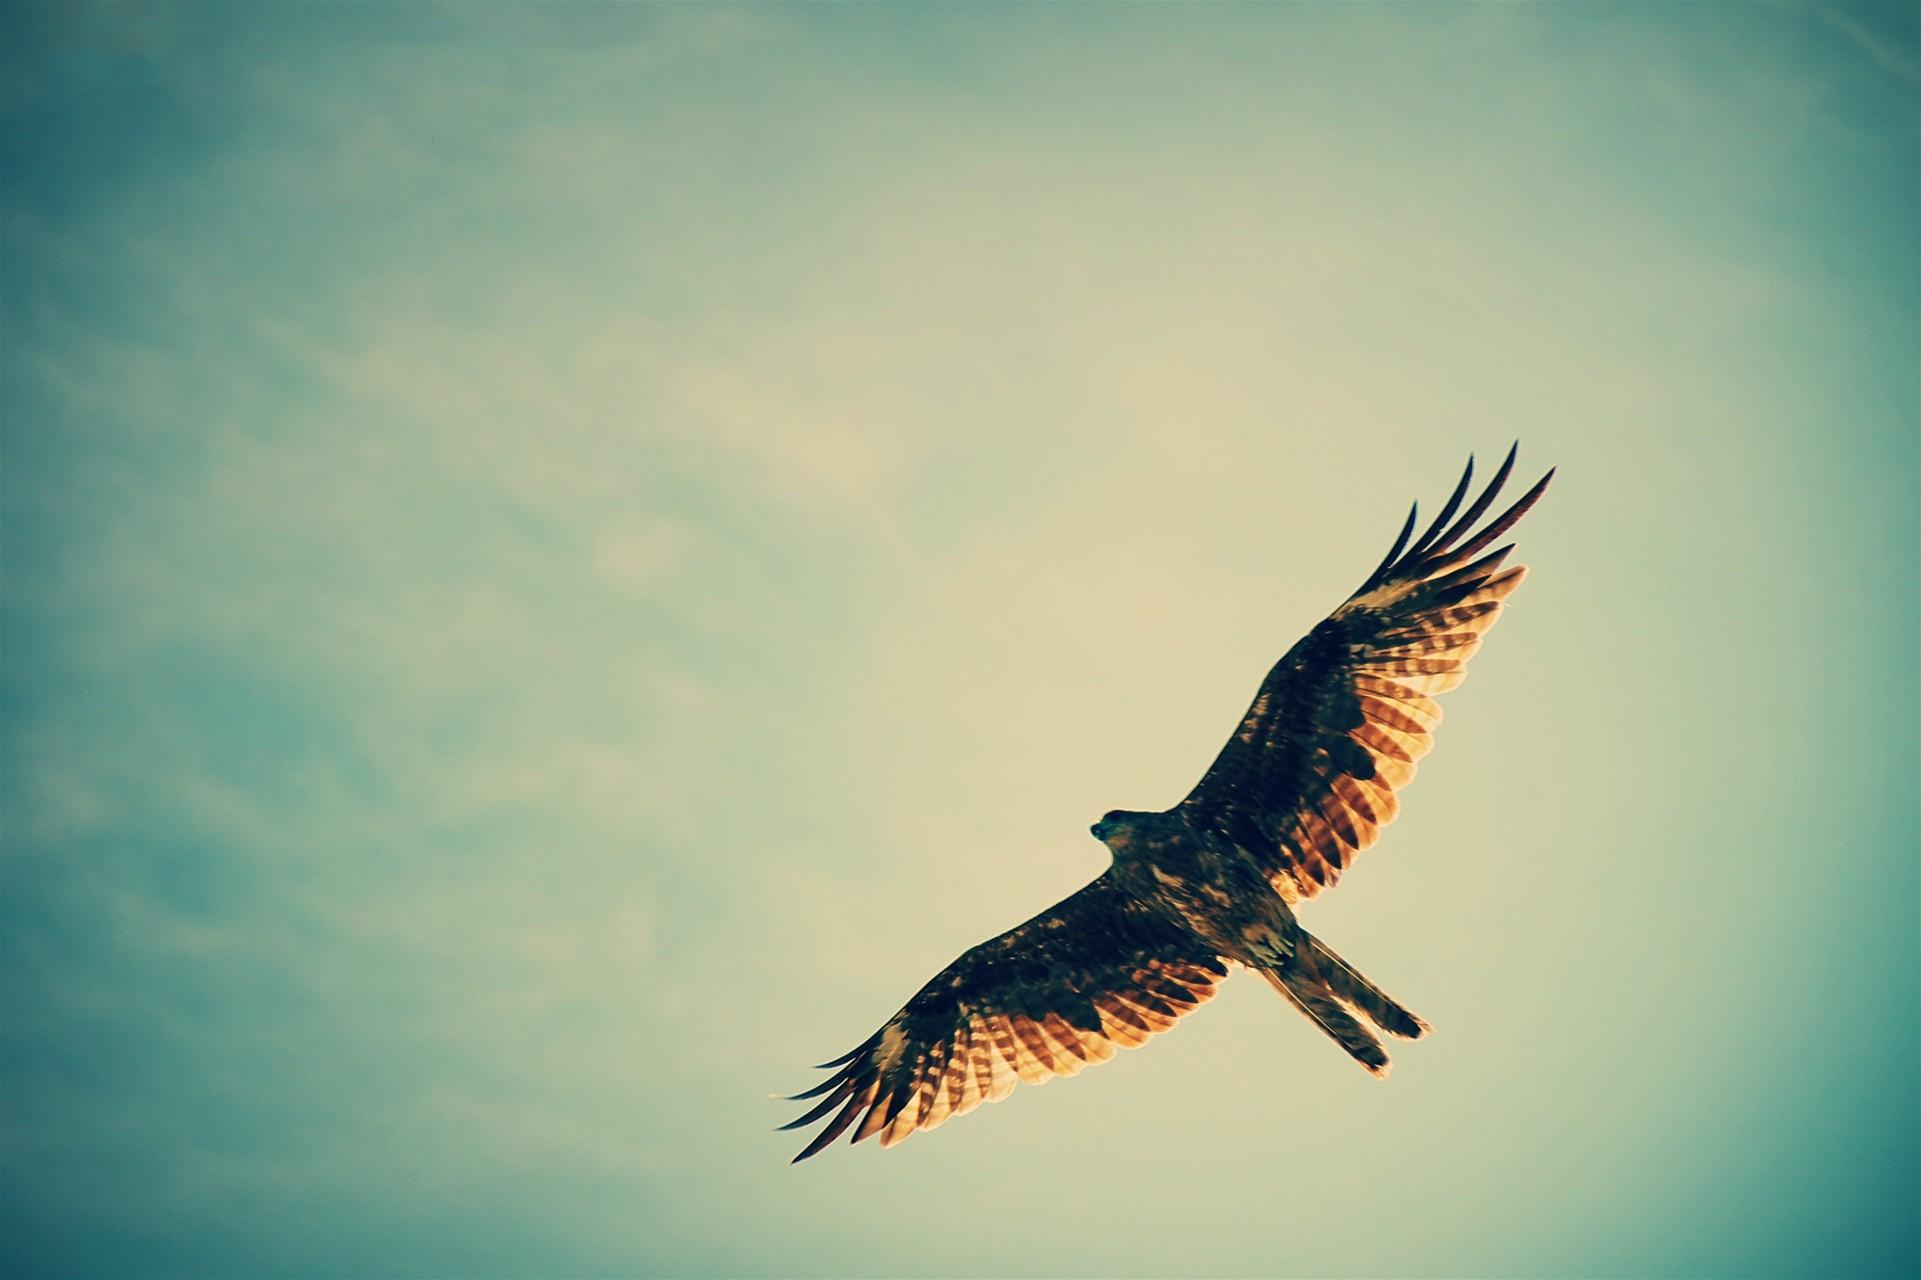 hawk hd wallpaper - photo #36